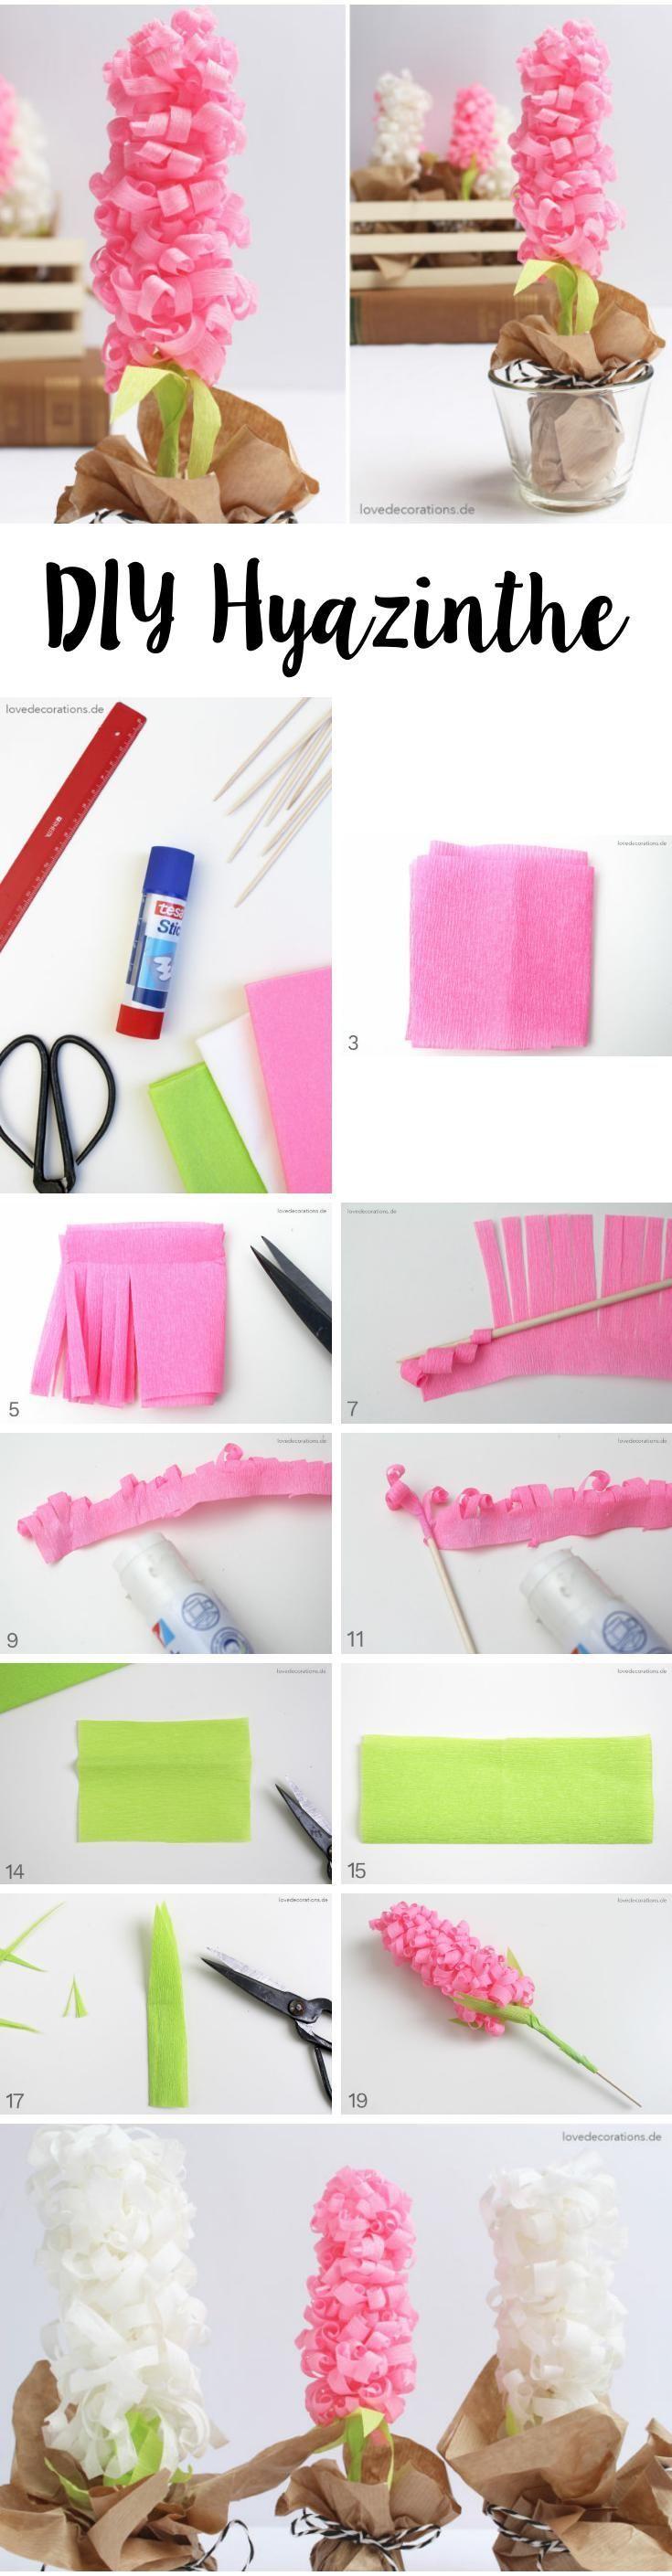 DIY Paper Hyacinth | DIY Hyazinthe Aus Krepppapier